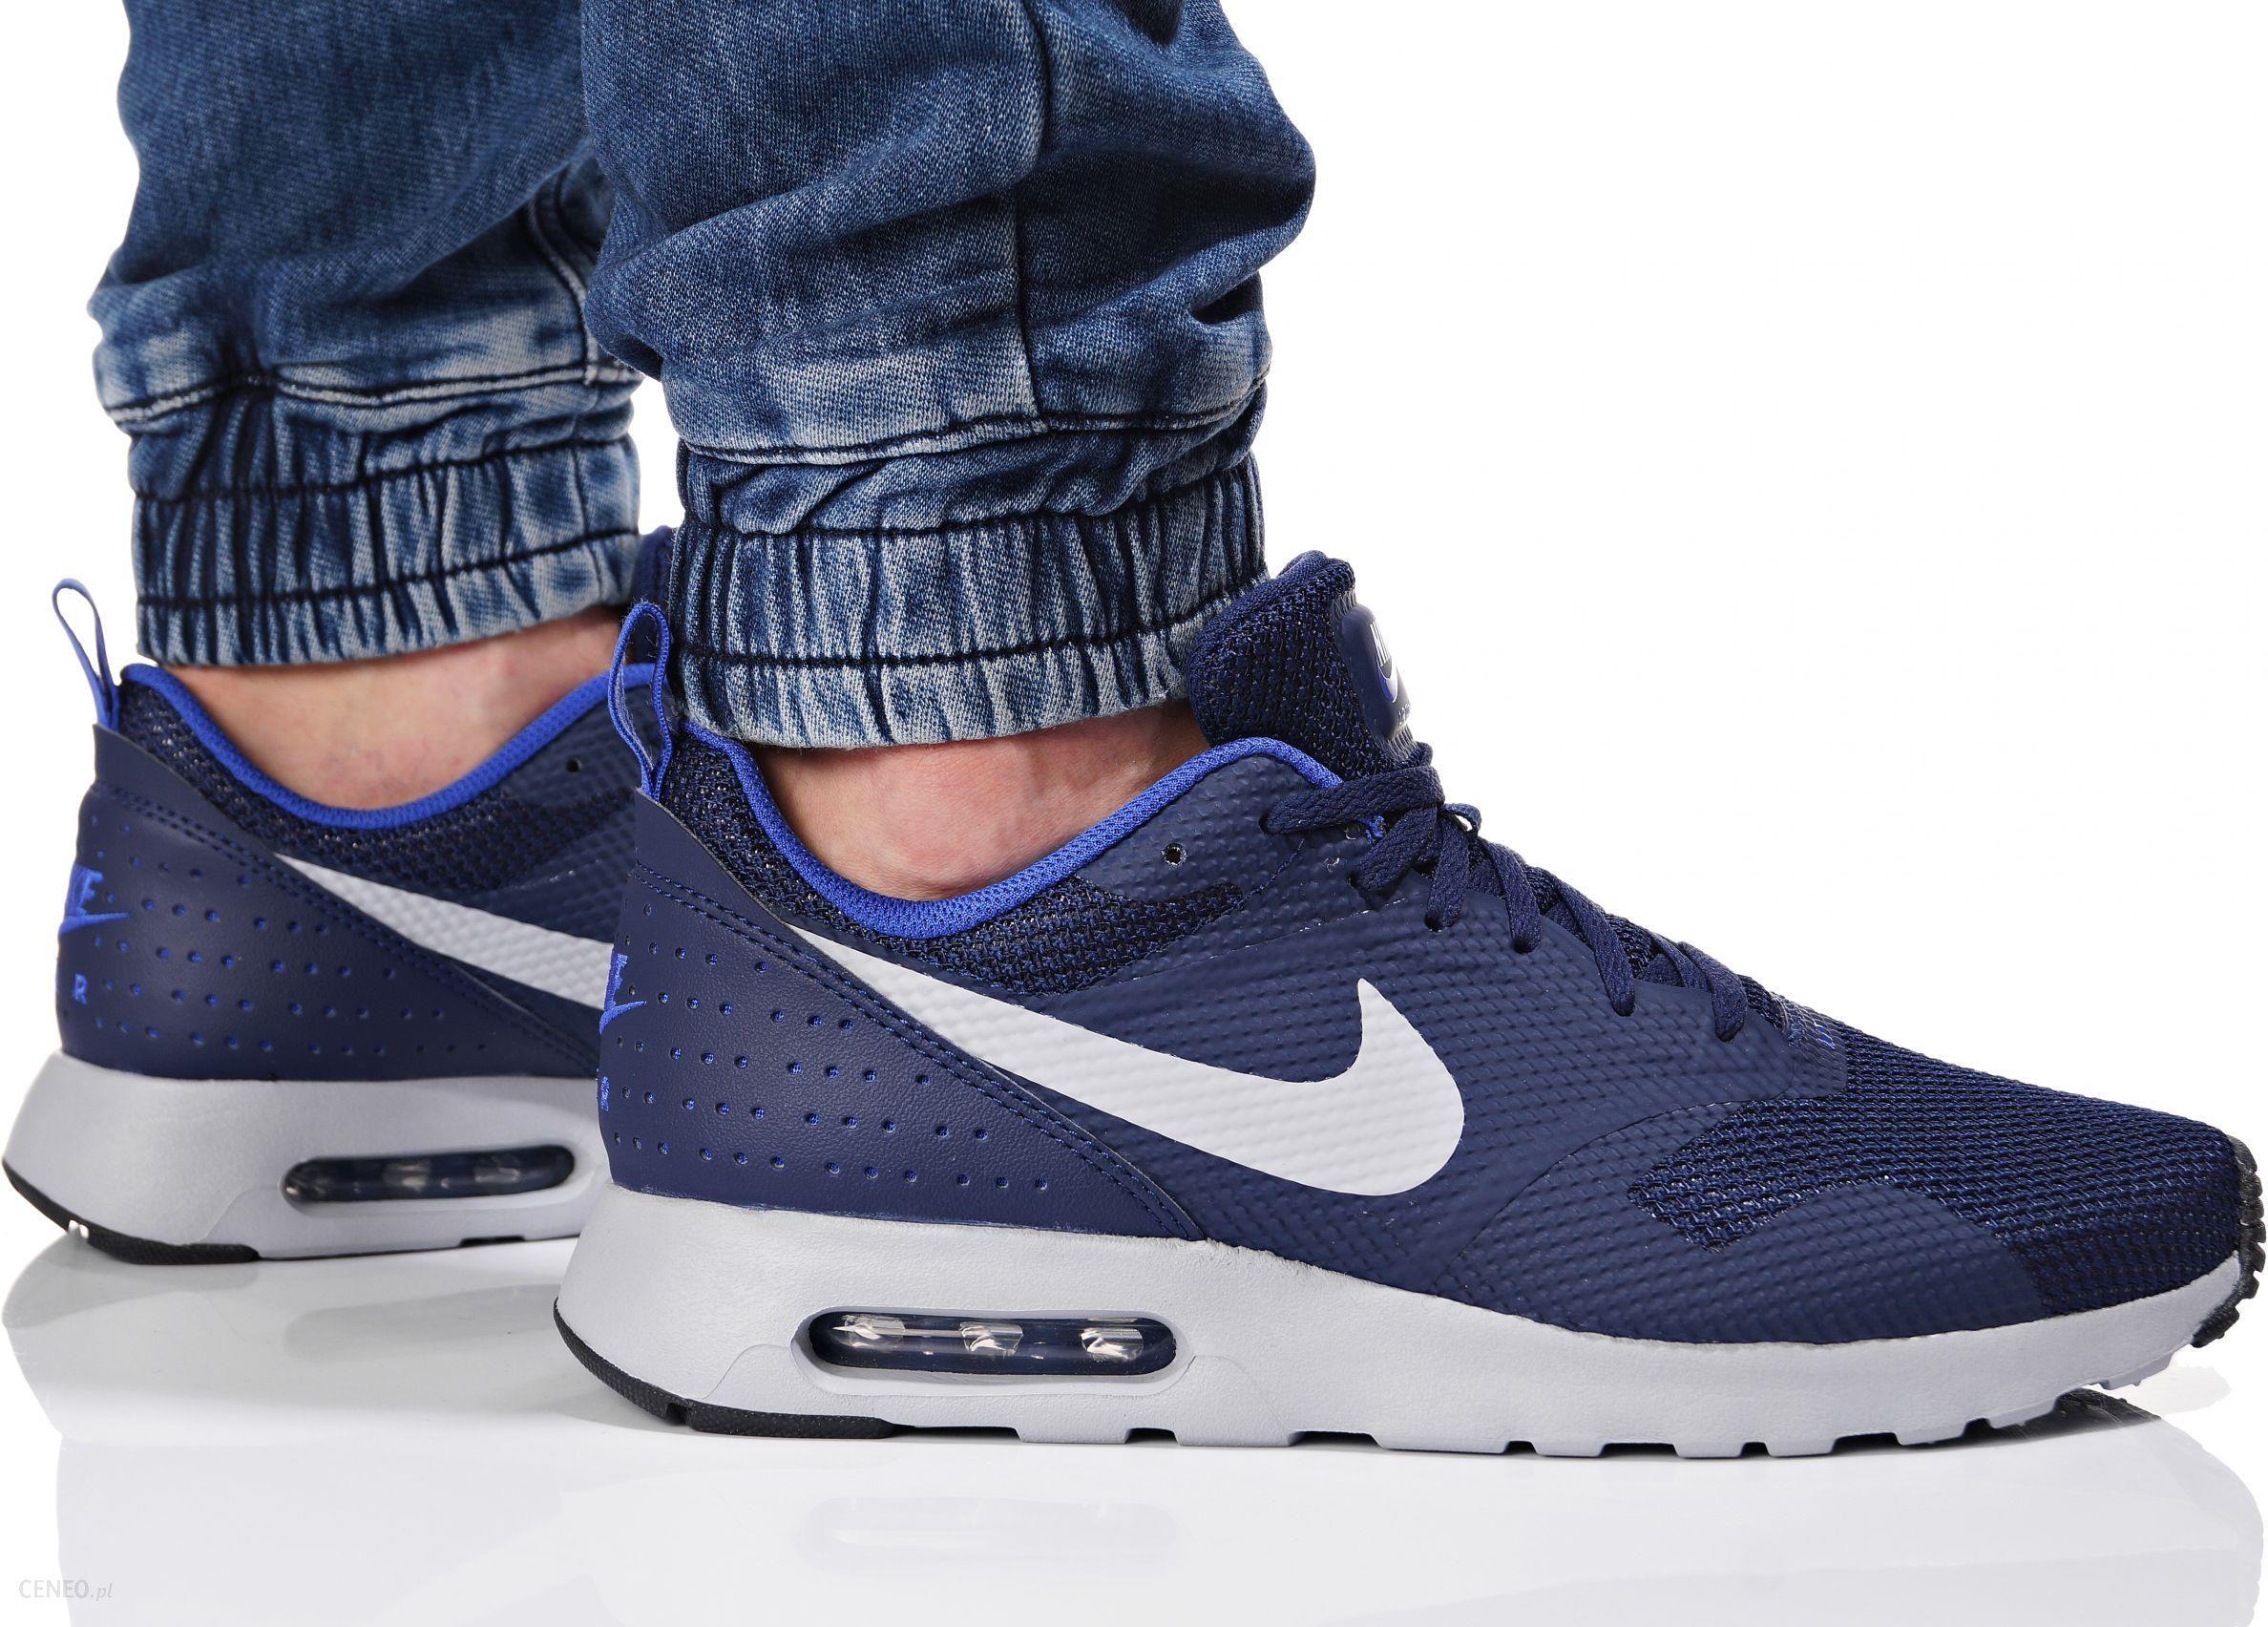 Buty Nike Air Max Tavas 705149 010 Ceny i opinie Ceneo.pl